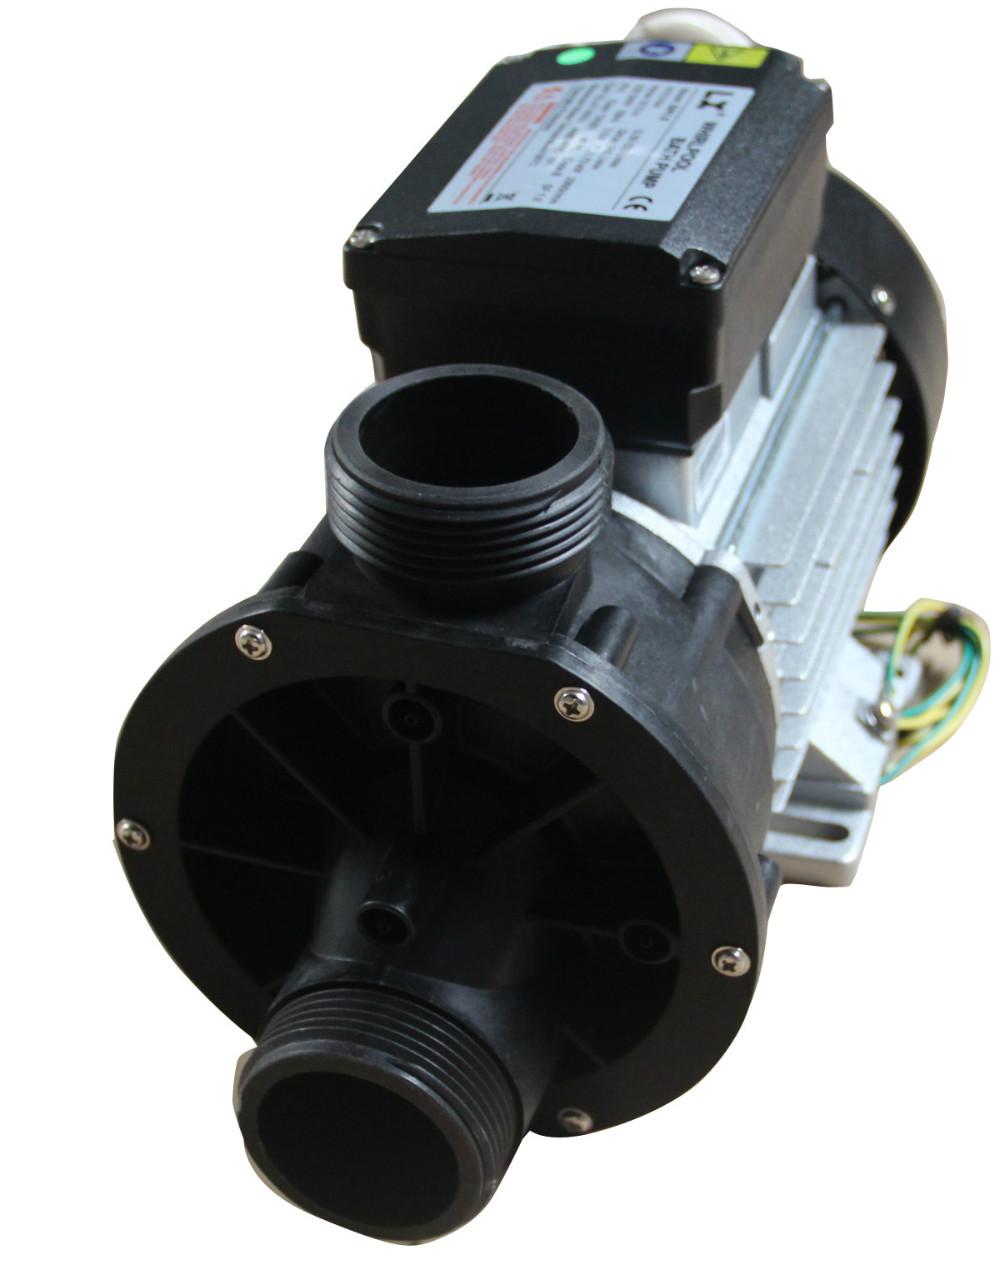 Comprar lx whirlpool bomba del ba o de for Comprar jacuzzi interior barato